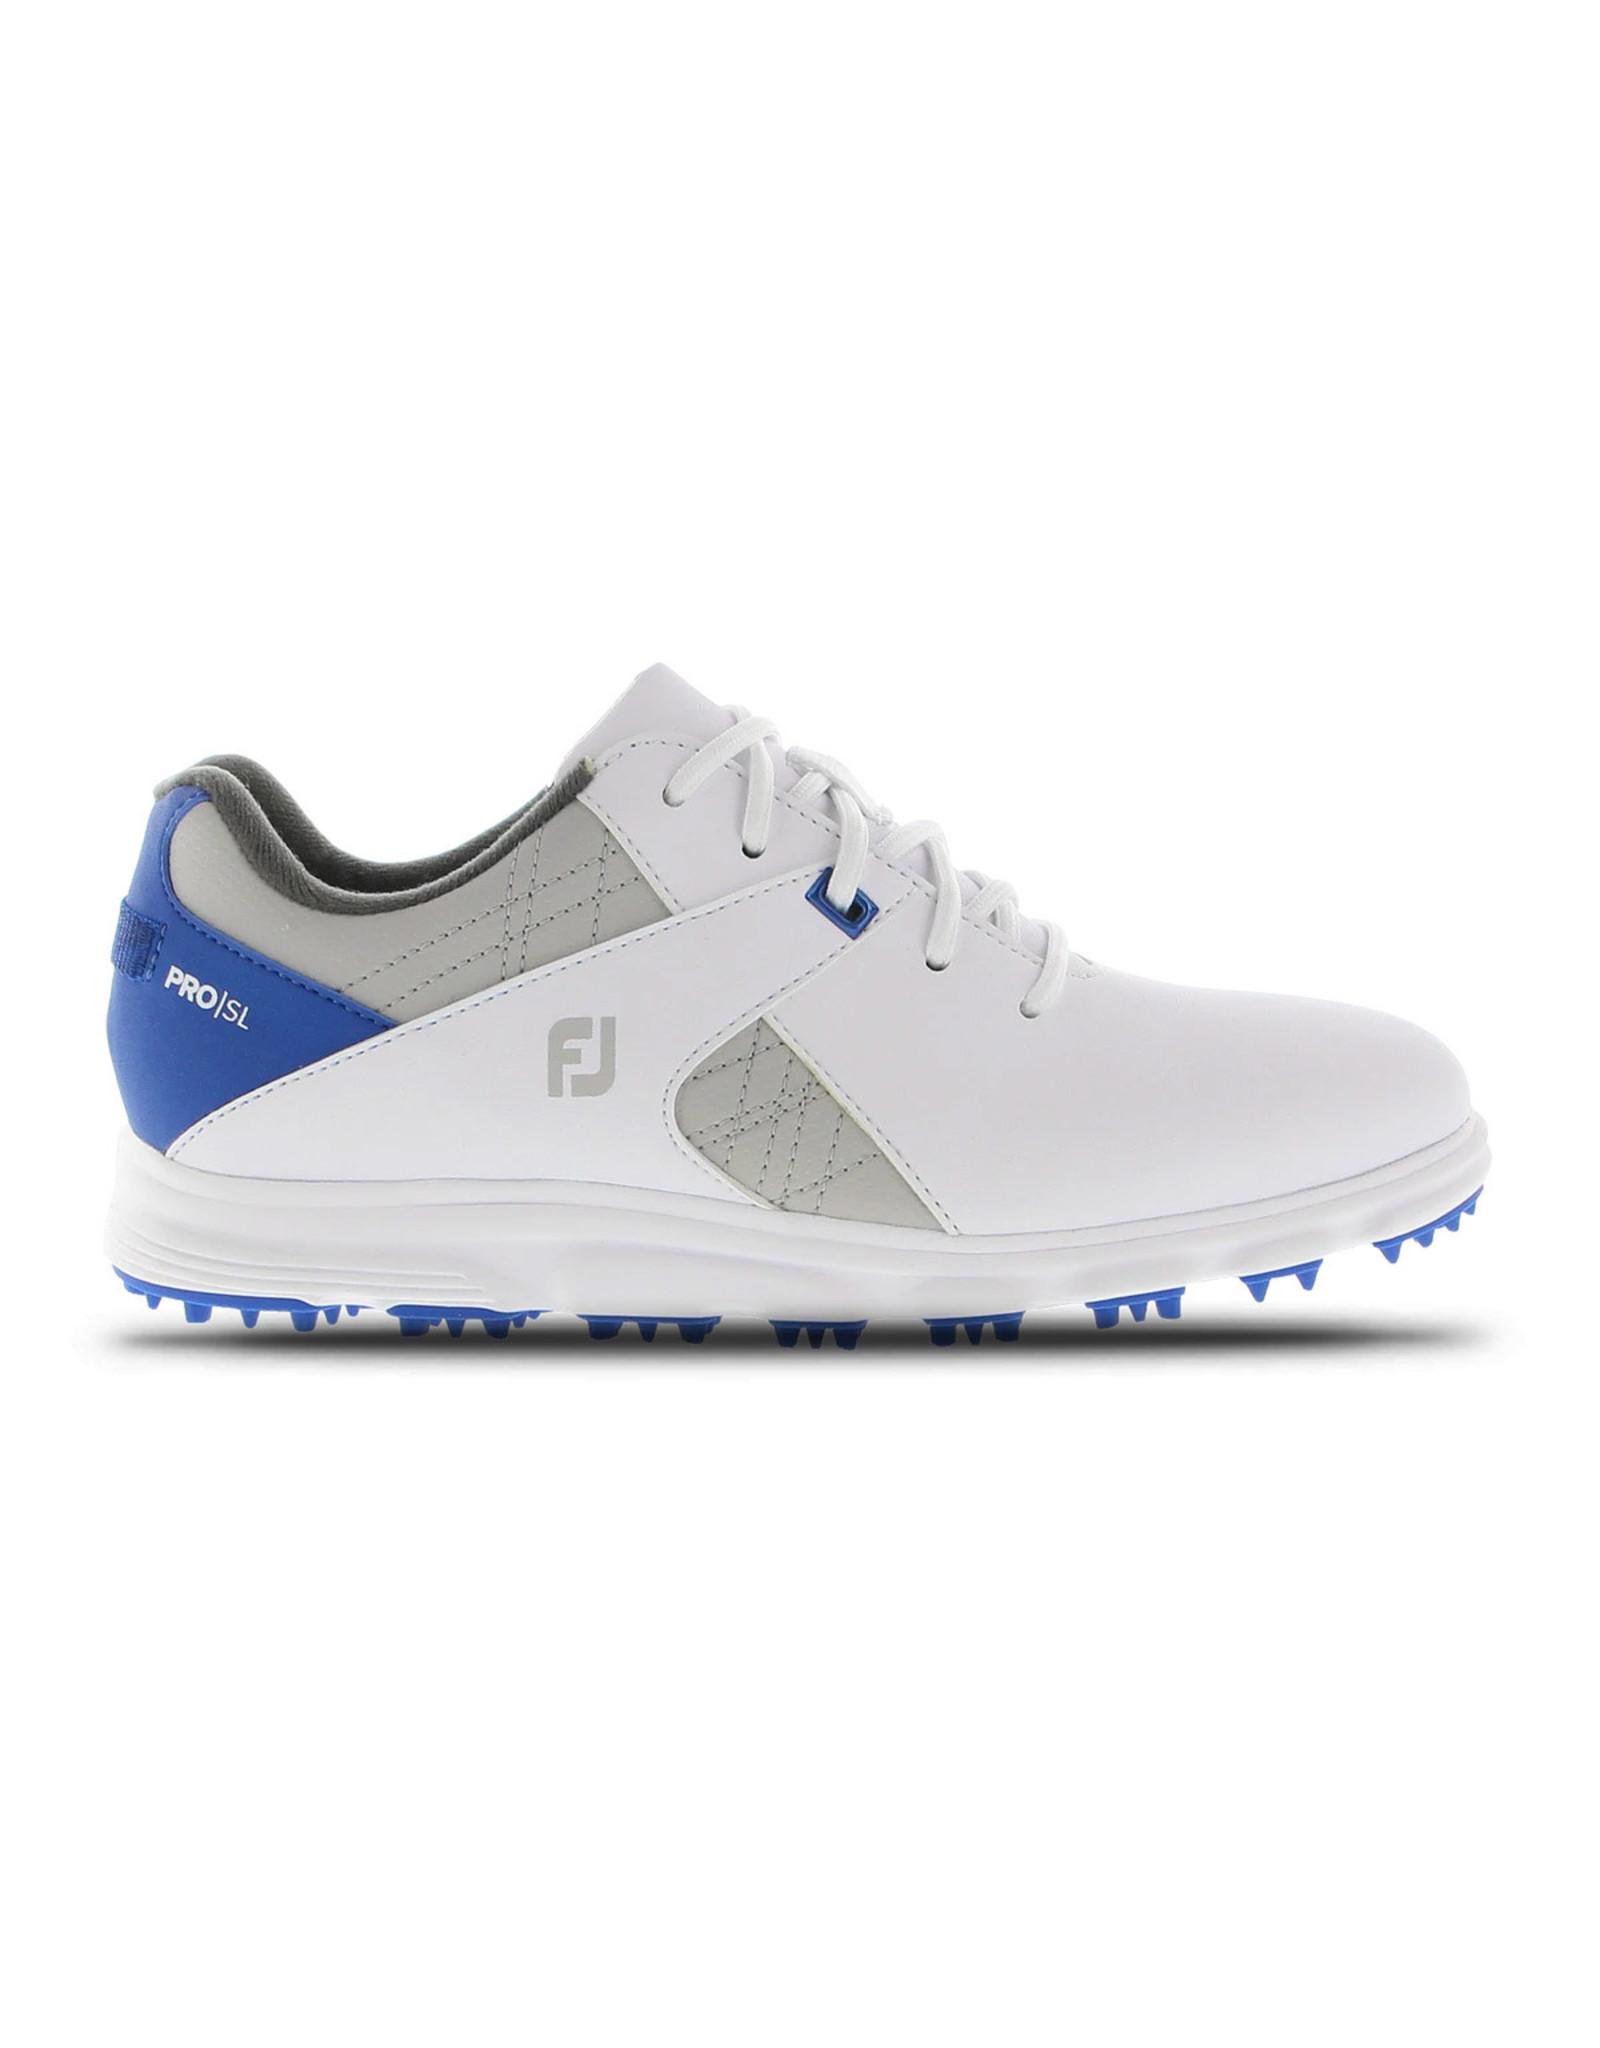 FootJoy FootJoy Jr Boys Pro SL White/Grey/Blue